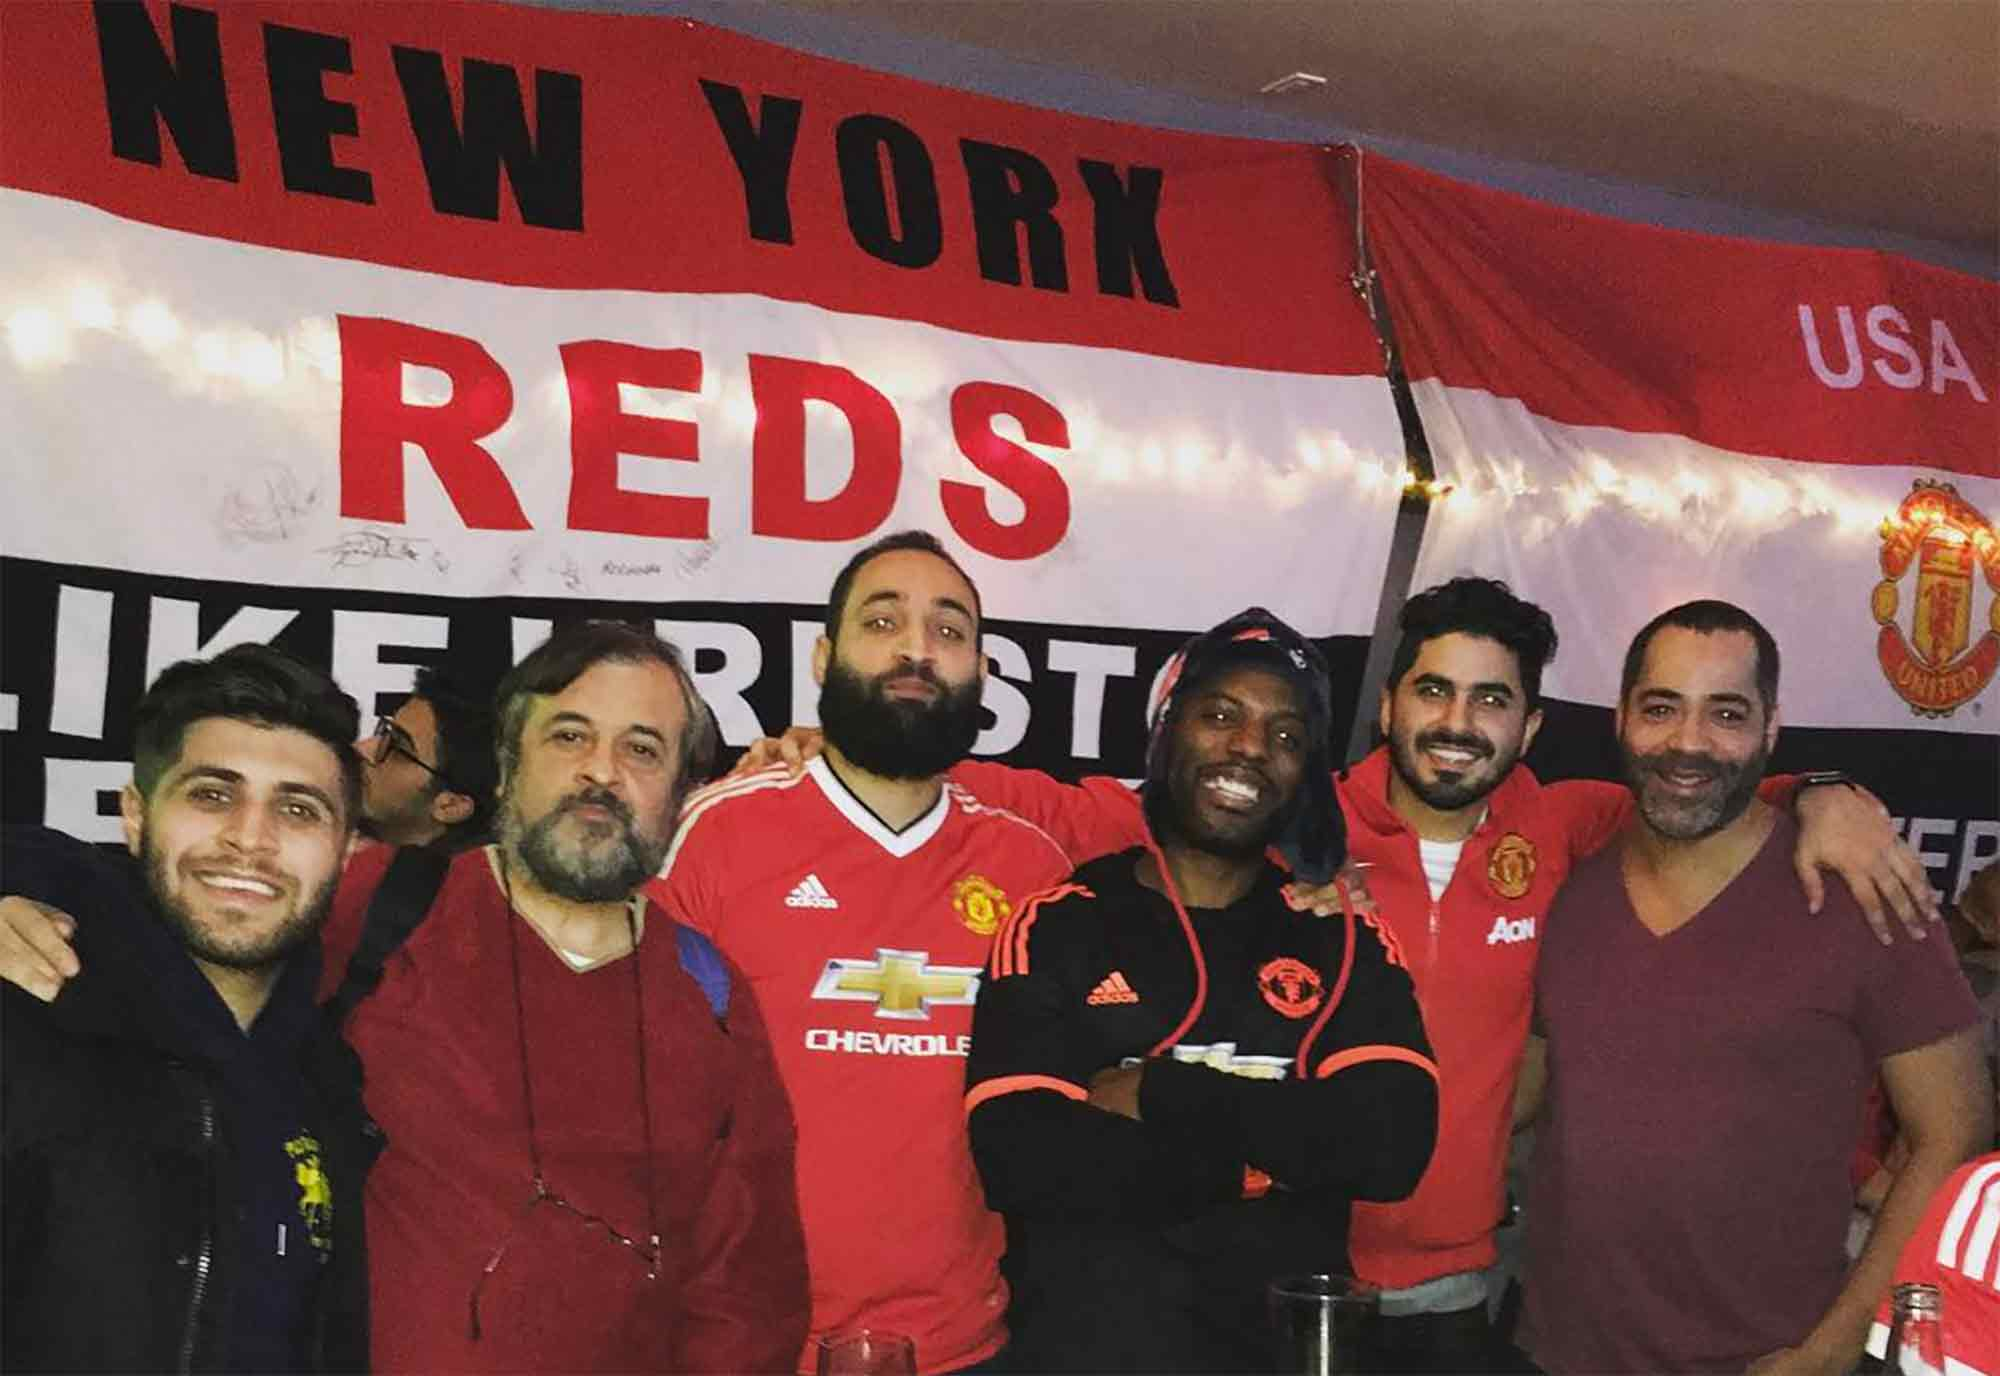 New York Reds